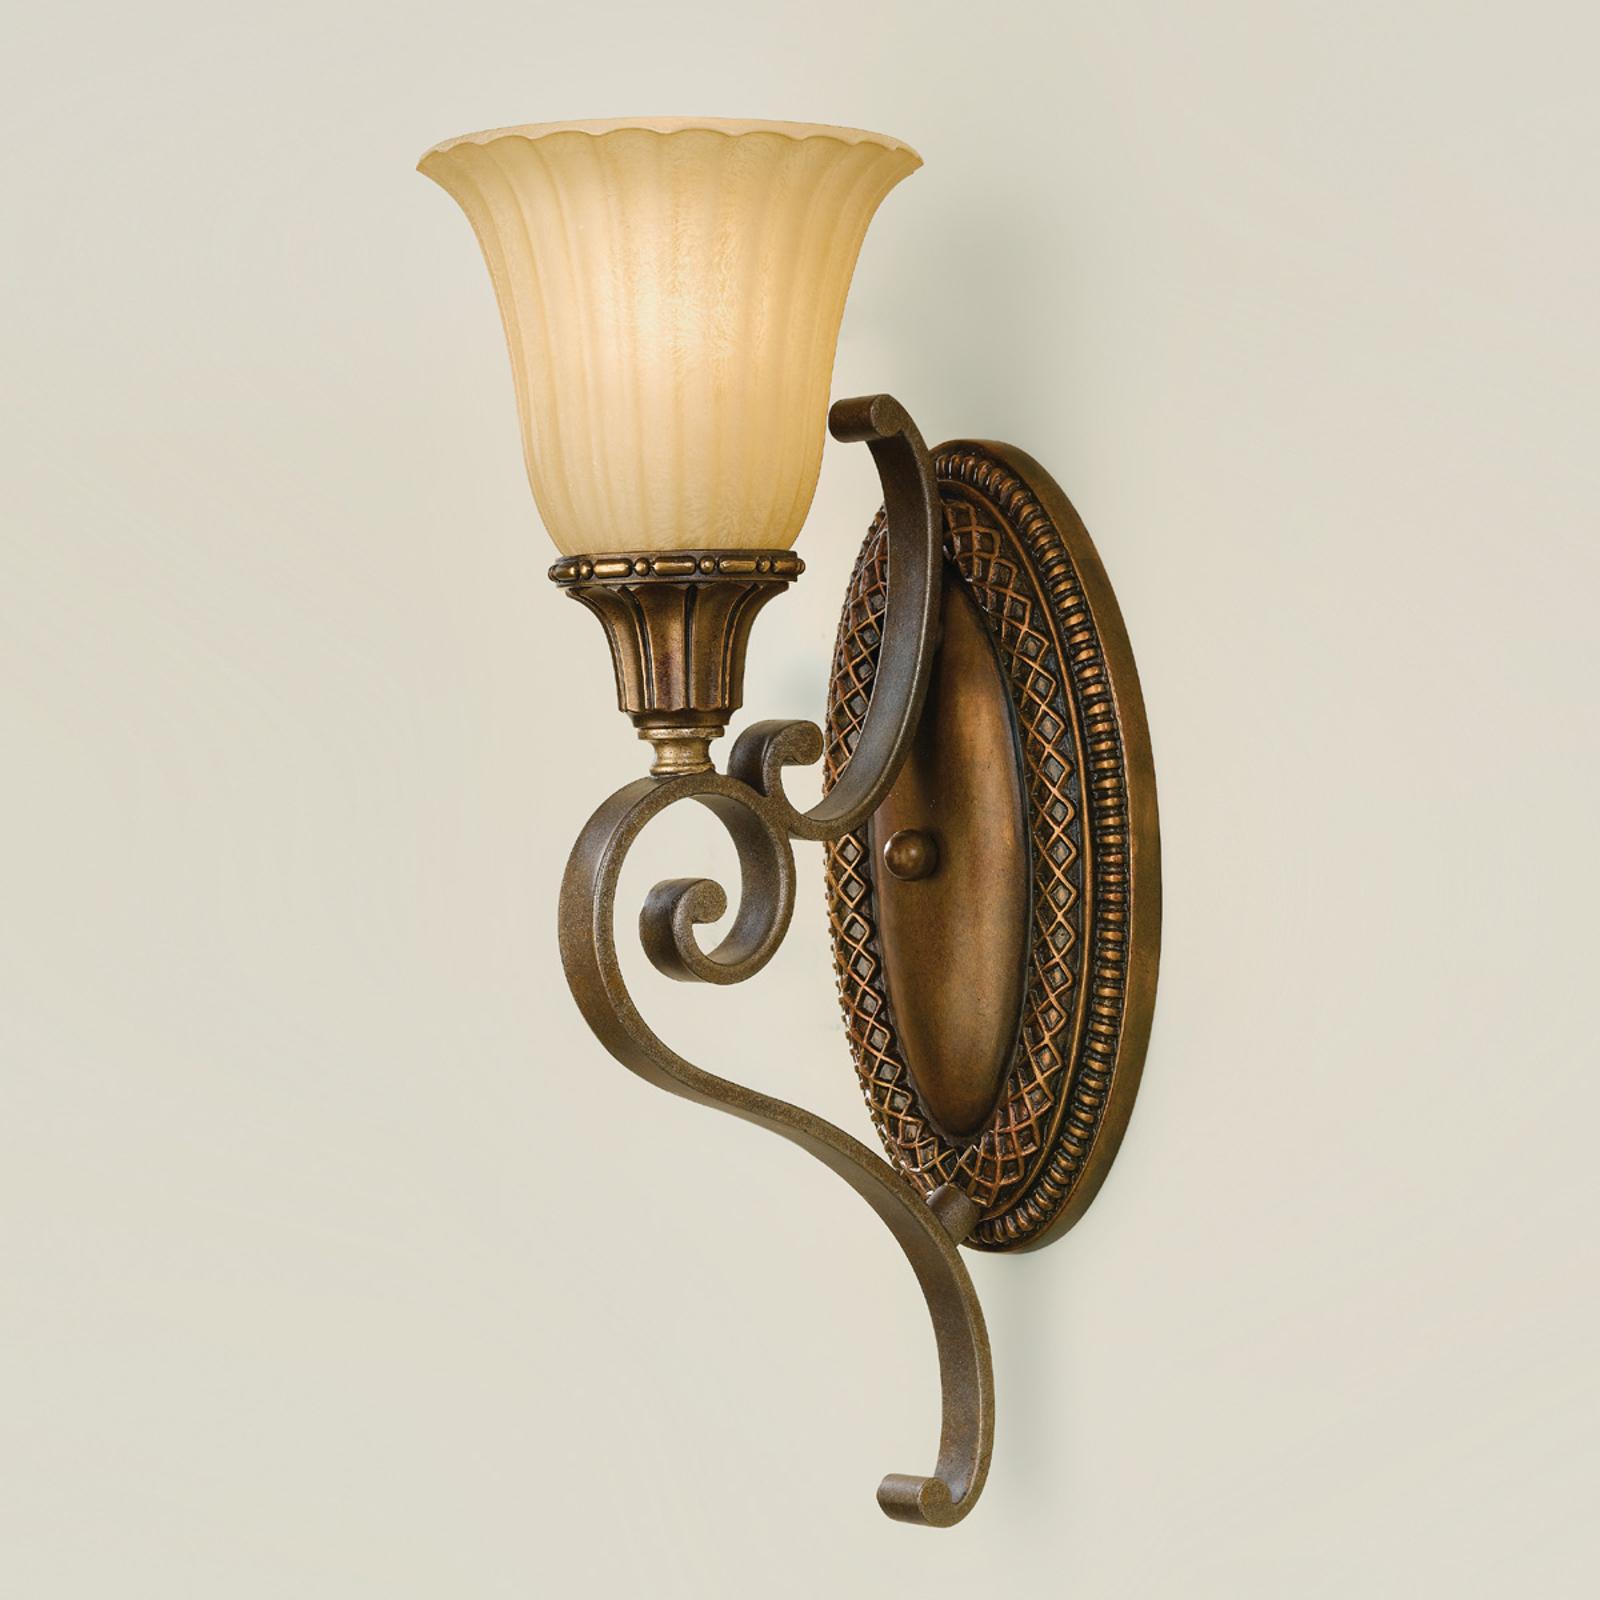 Nástenné svietidlo KELHAM HALL bronz/zlato_3048080_1